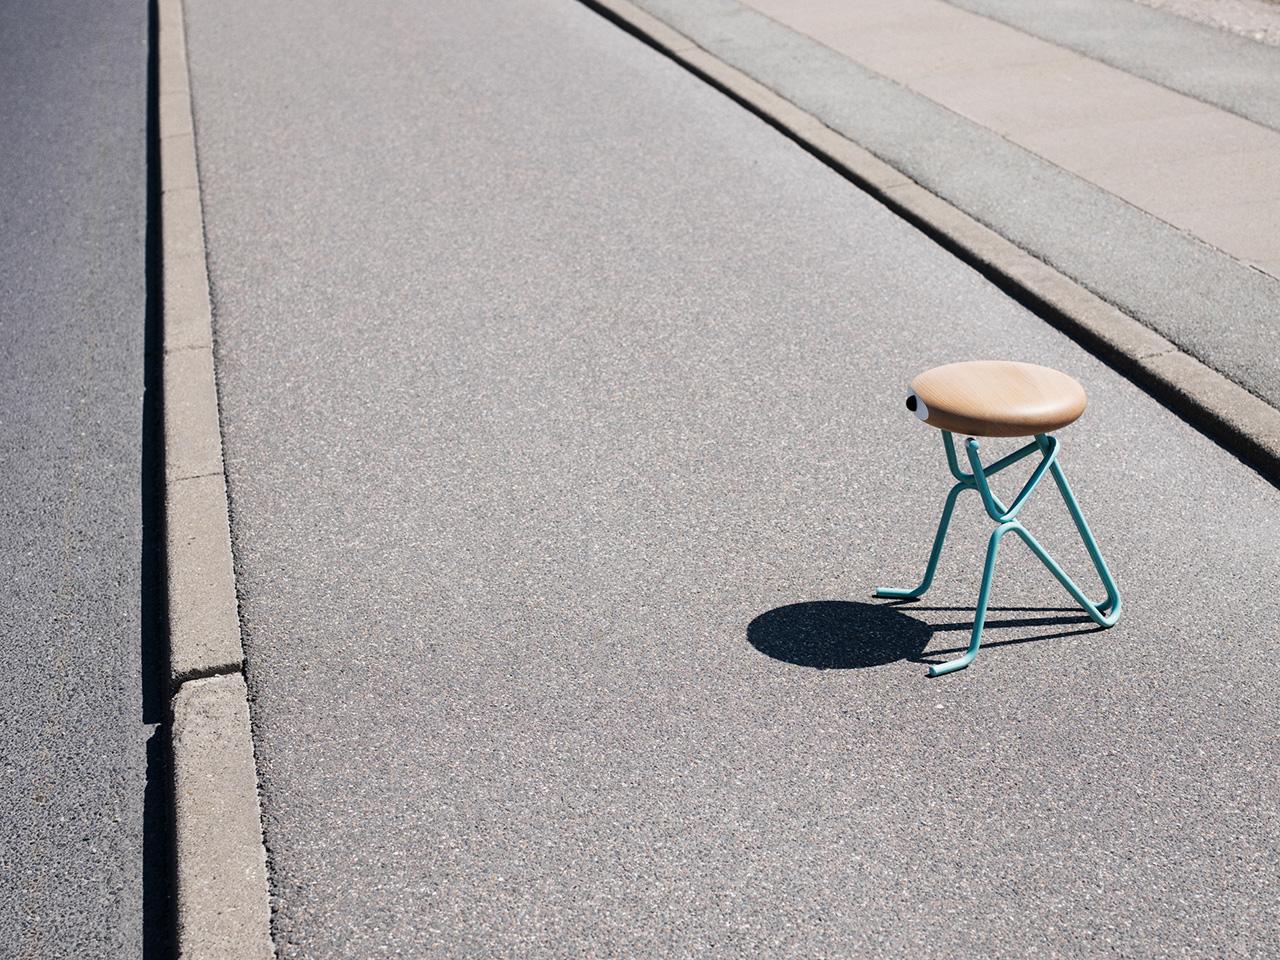 3039837-slide-s-11-cyclops-stools-that-look-like-adorable